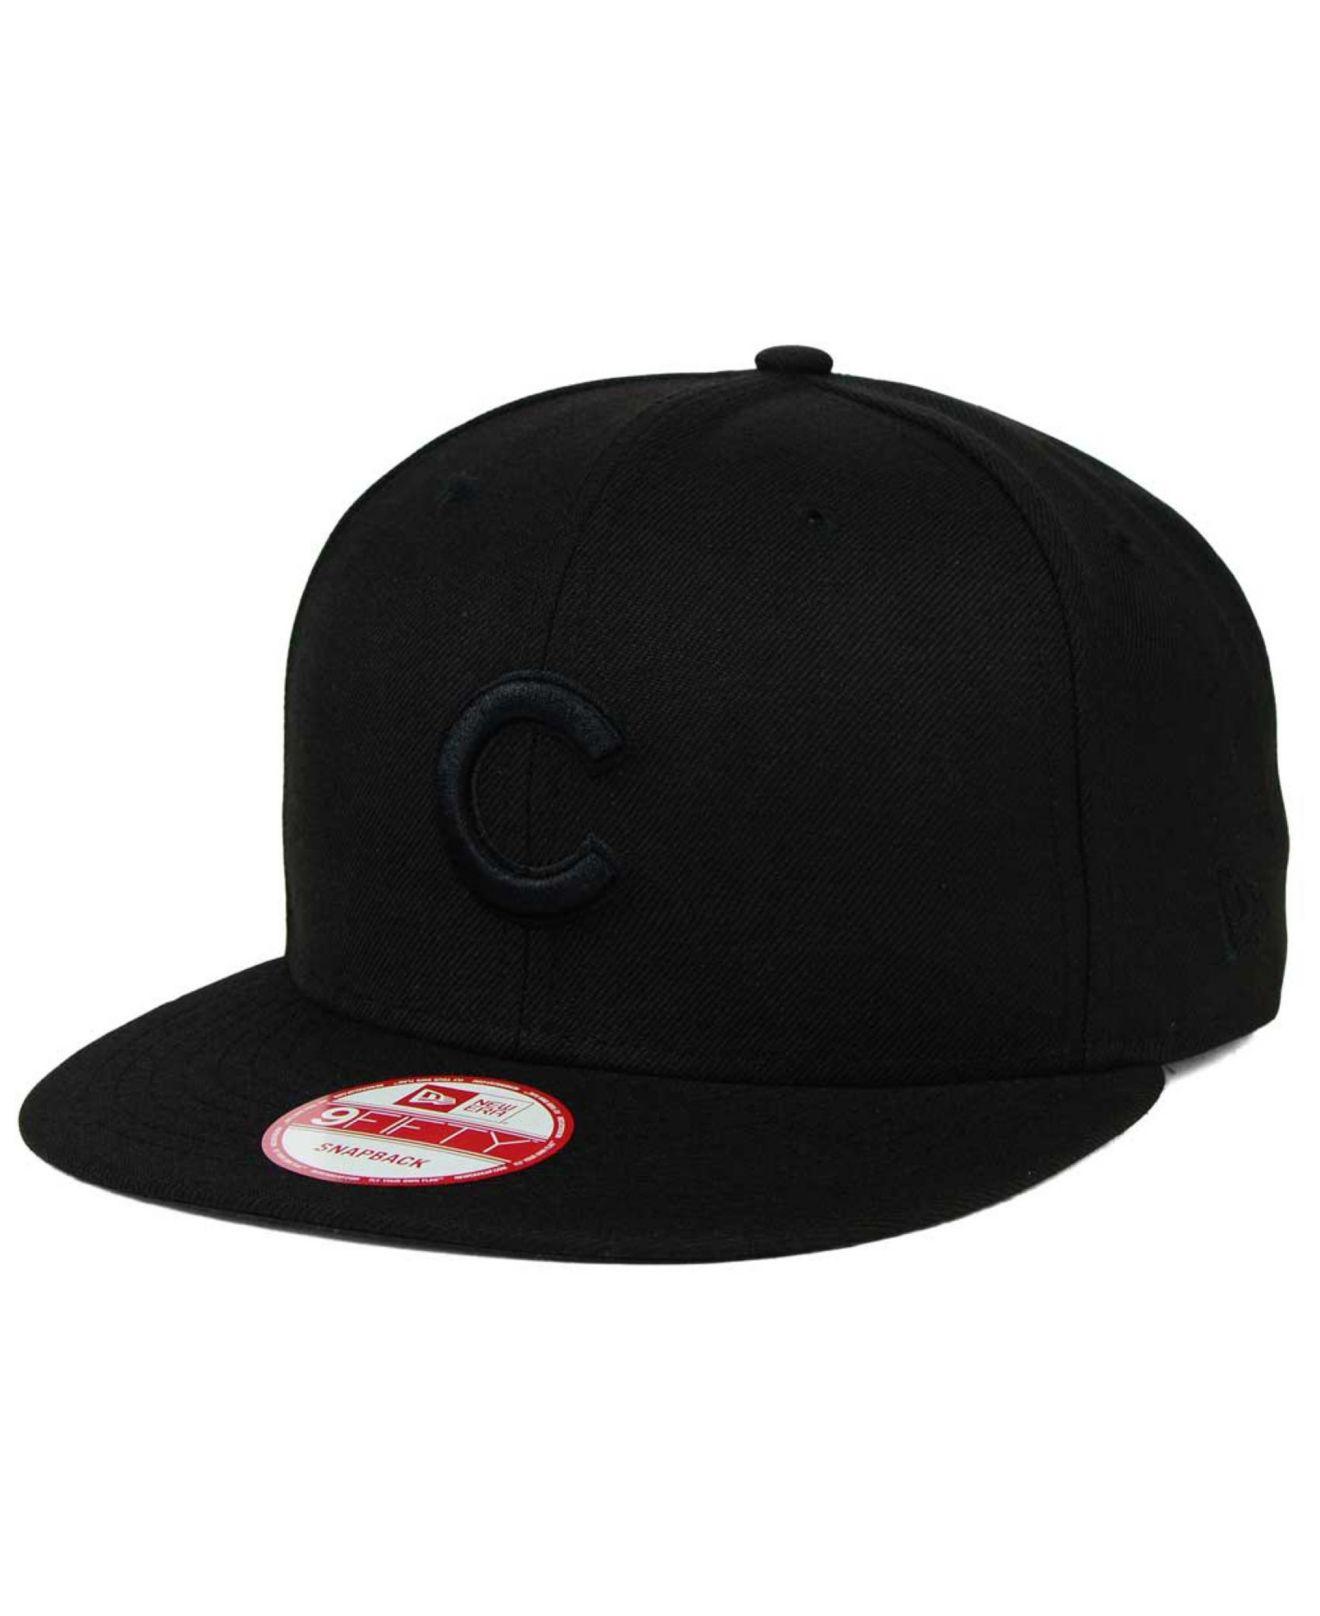 e3728e7059b Lyst - KTZ Chicago Cubs Black On Black 9fifty Snapback Cap in Black ...